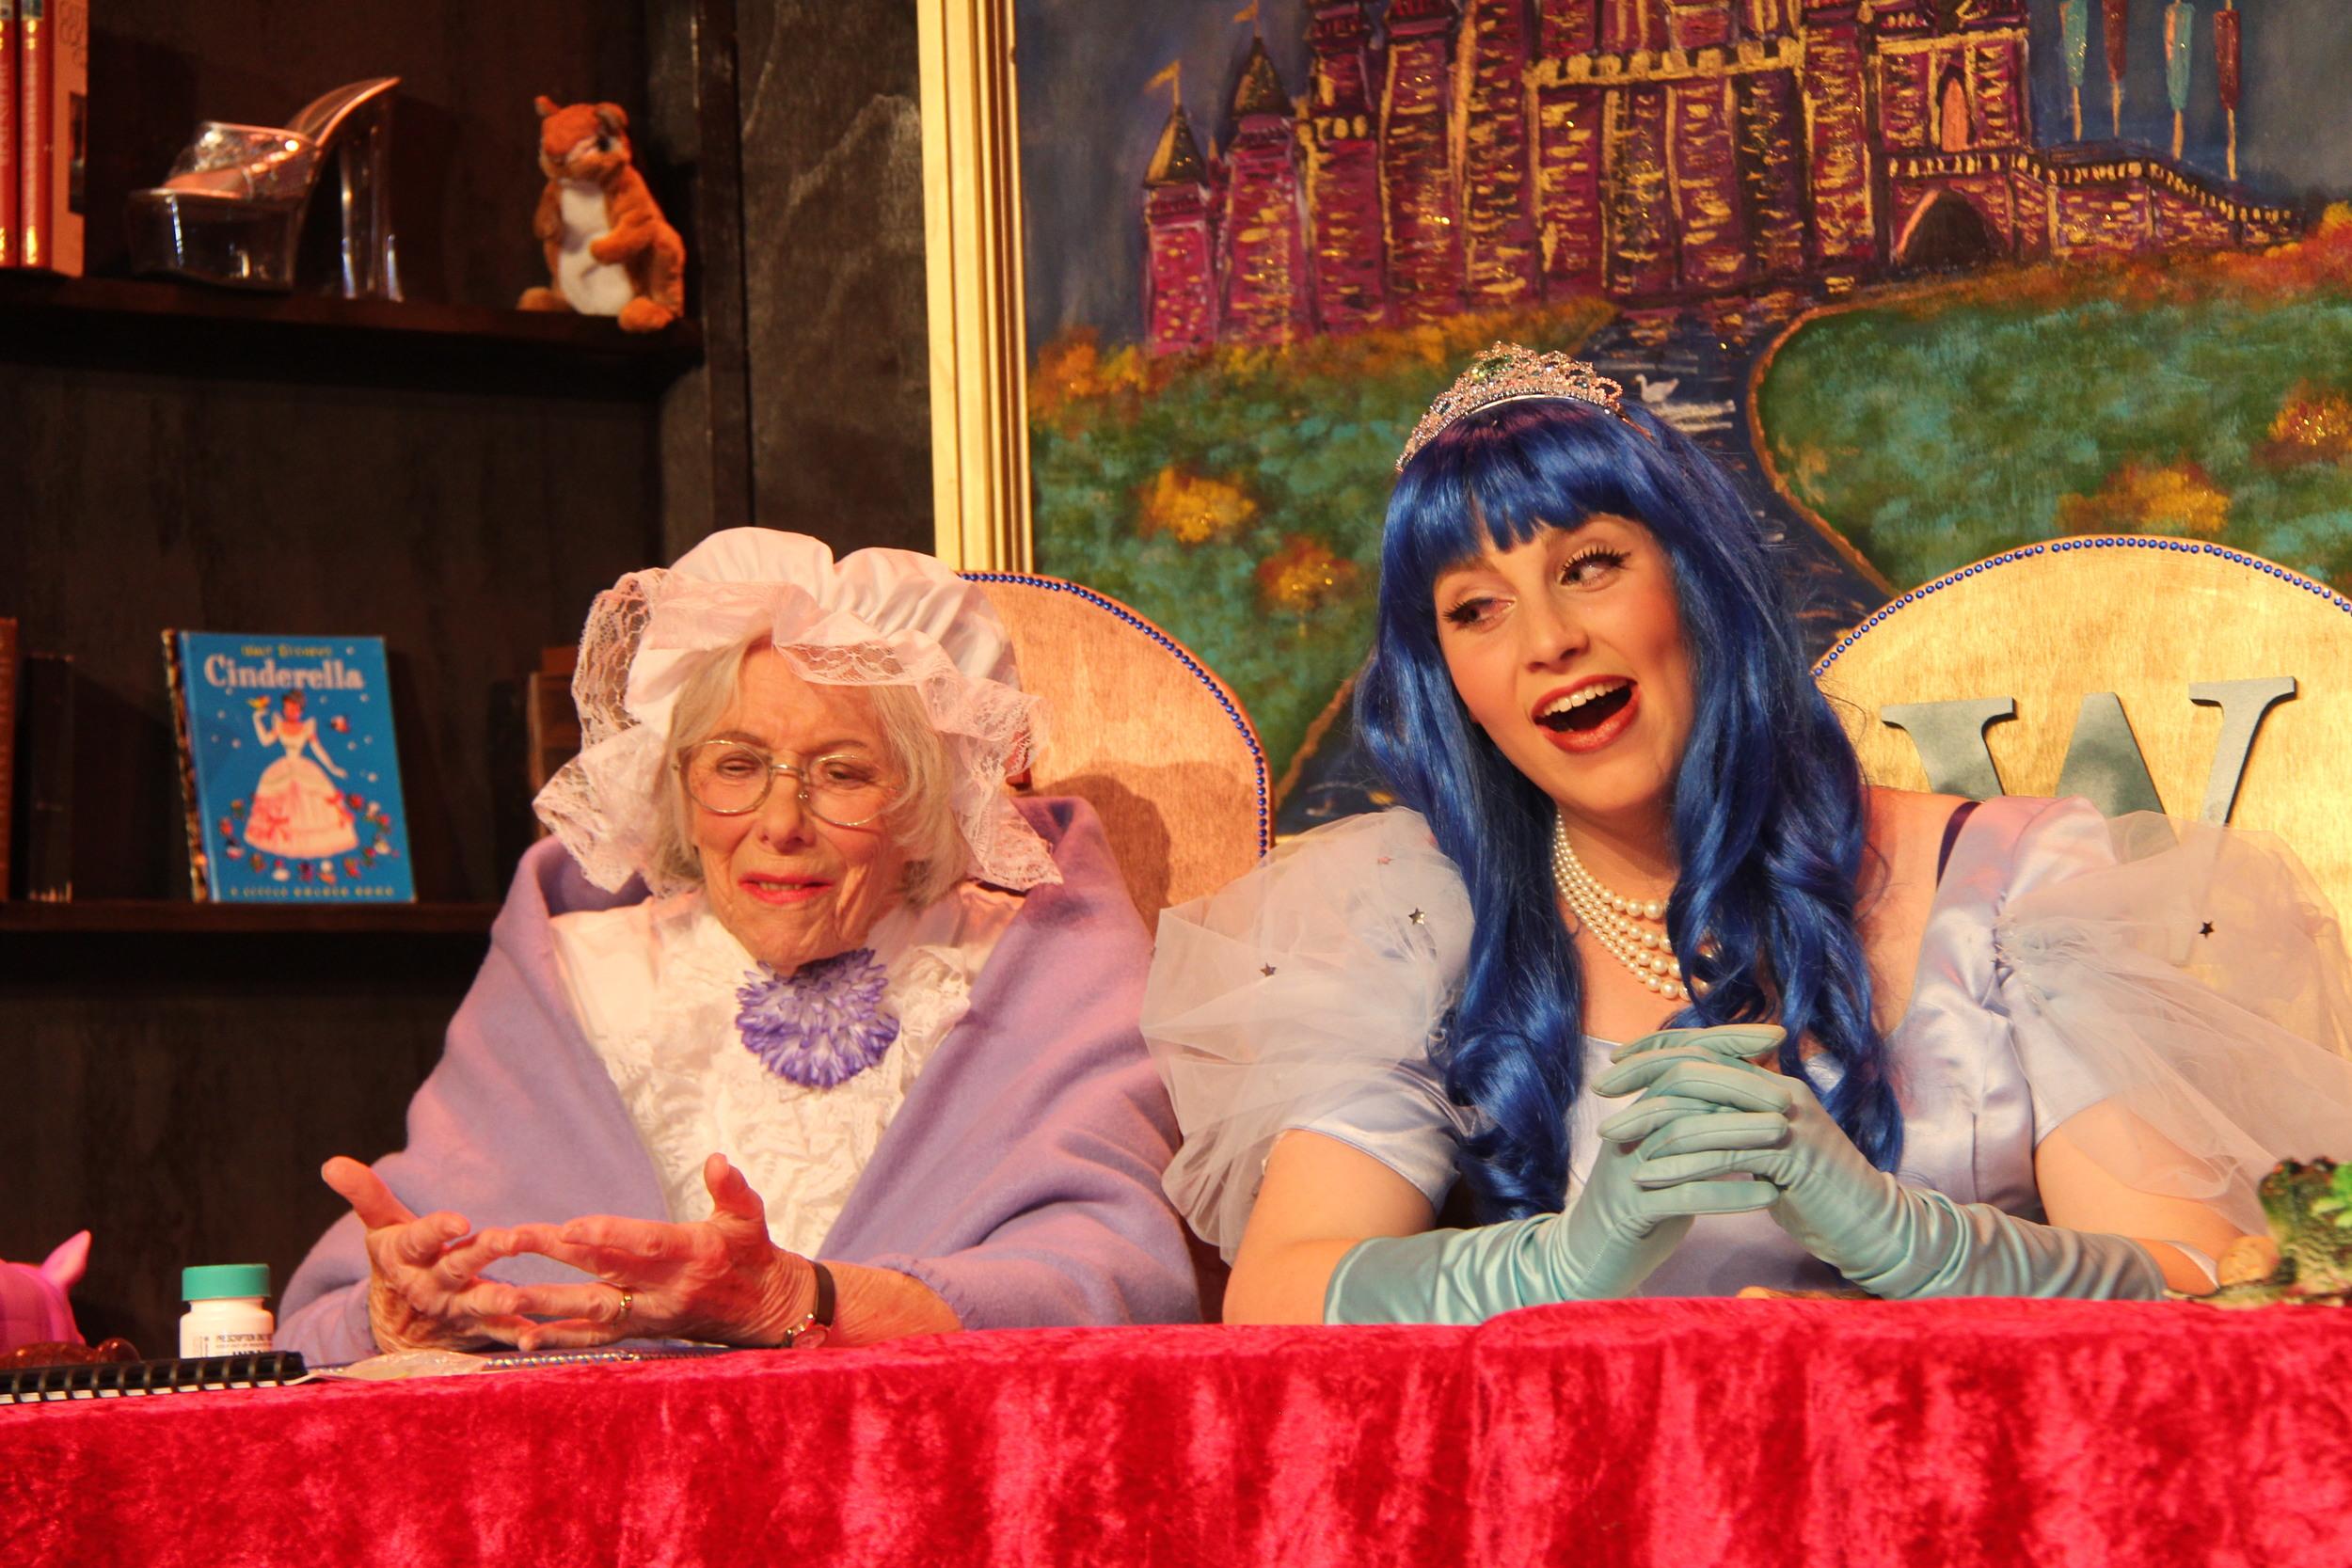 Ursula Johnson as grandma and Sophie Prober as Cinderella in  The Broken Slipper .